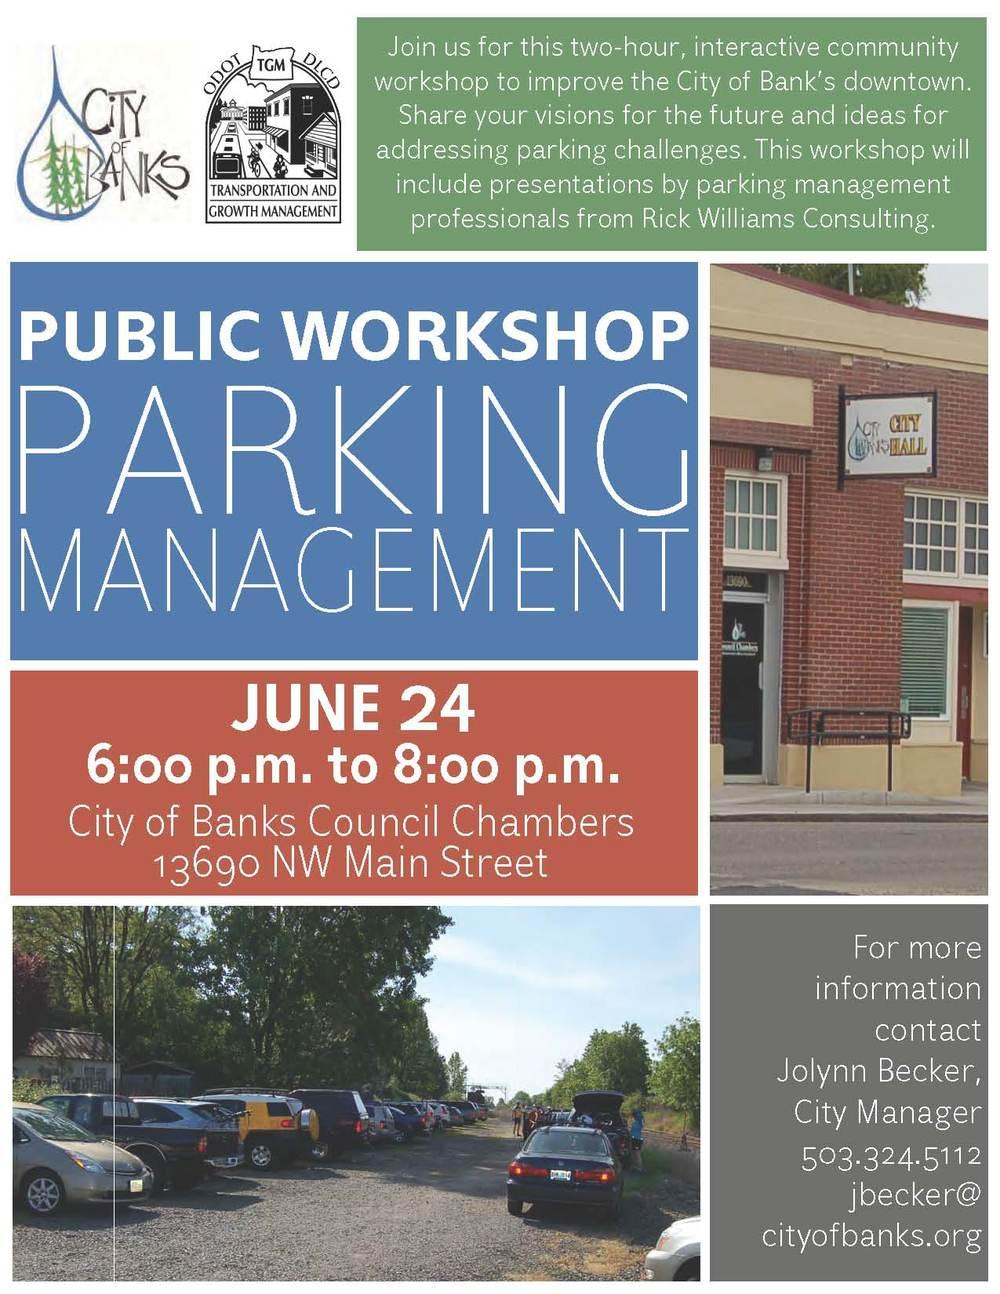 Downtown Parking Management